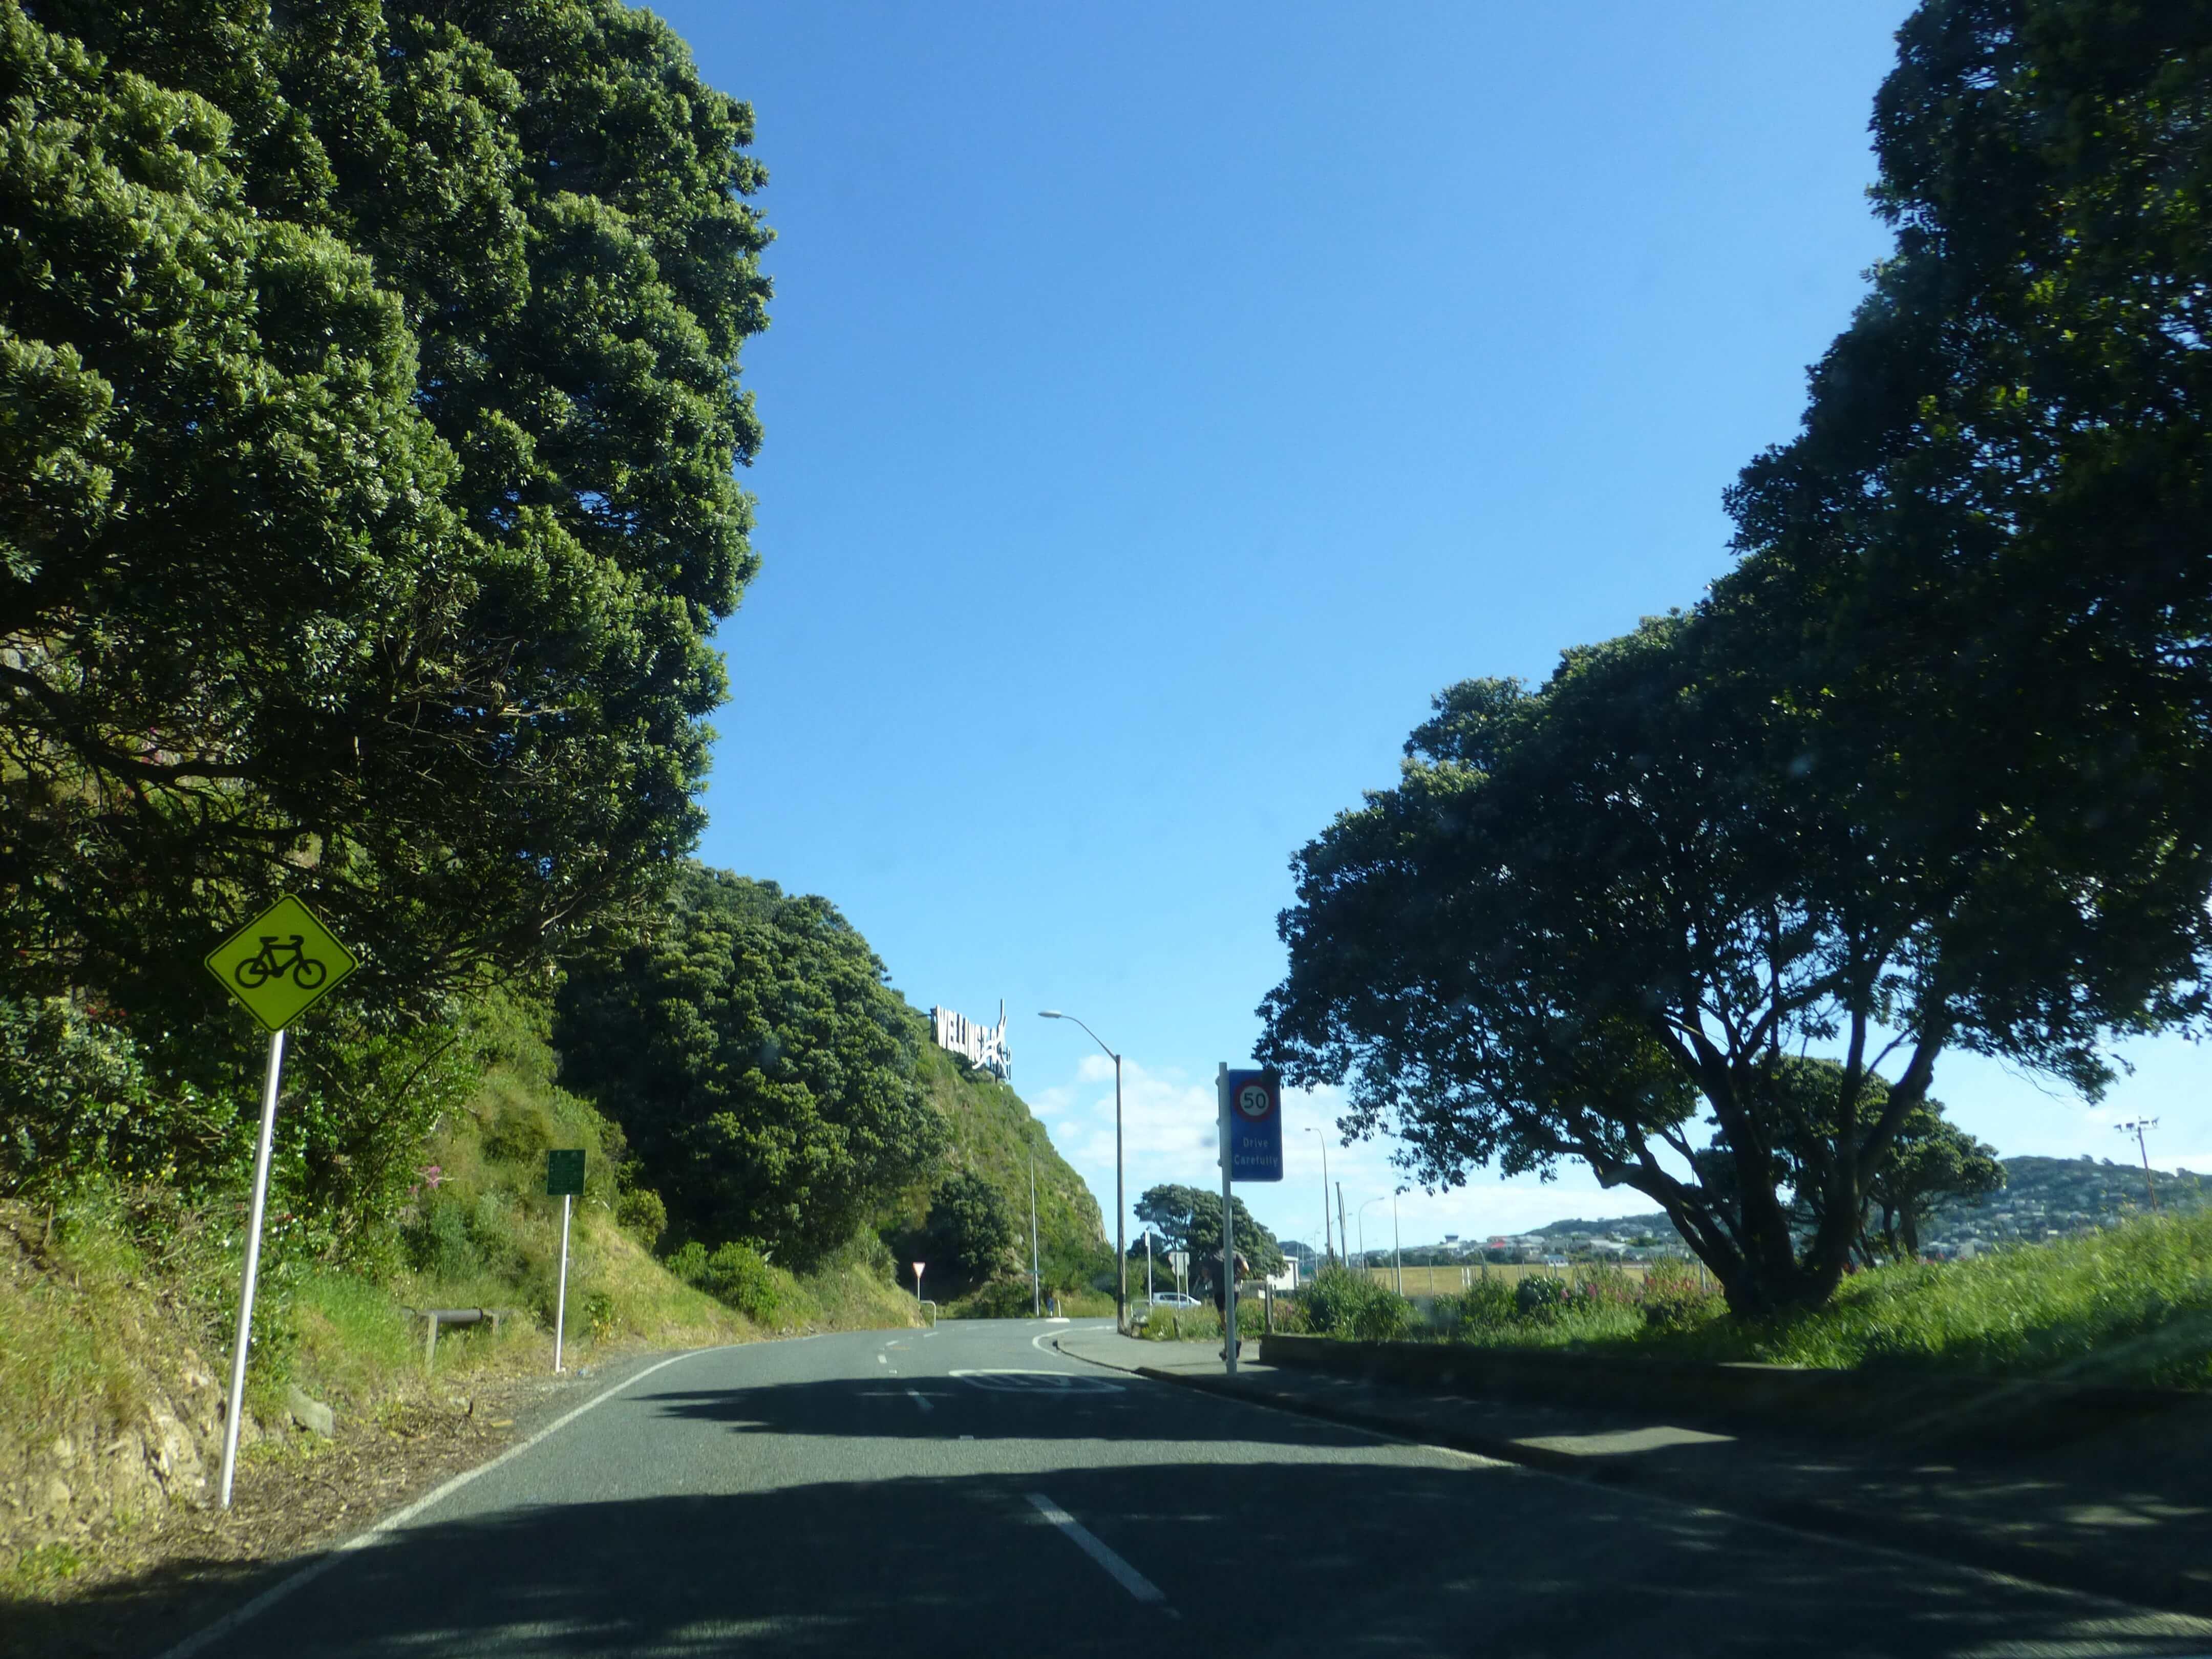 Wellington, Miramar, Weit-weg.reisen, 3